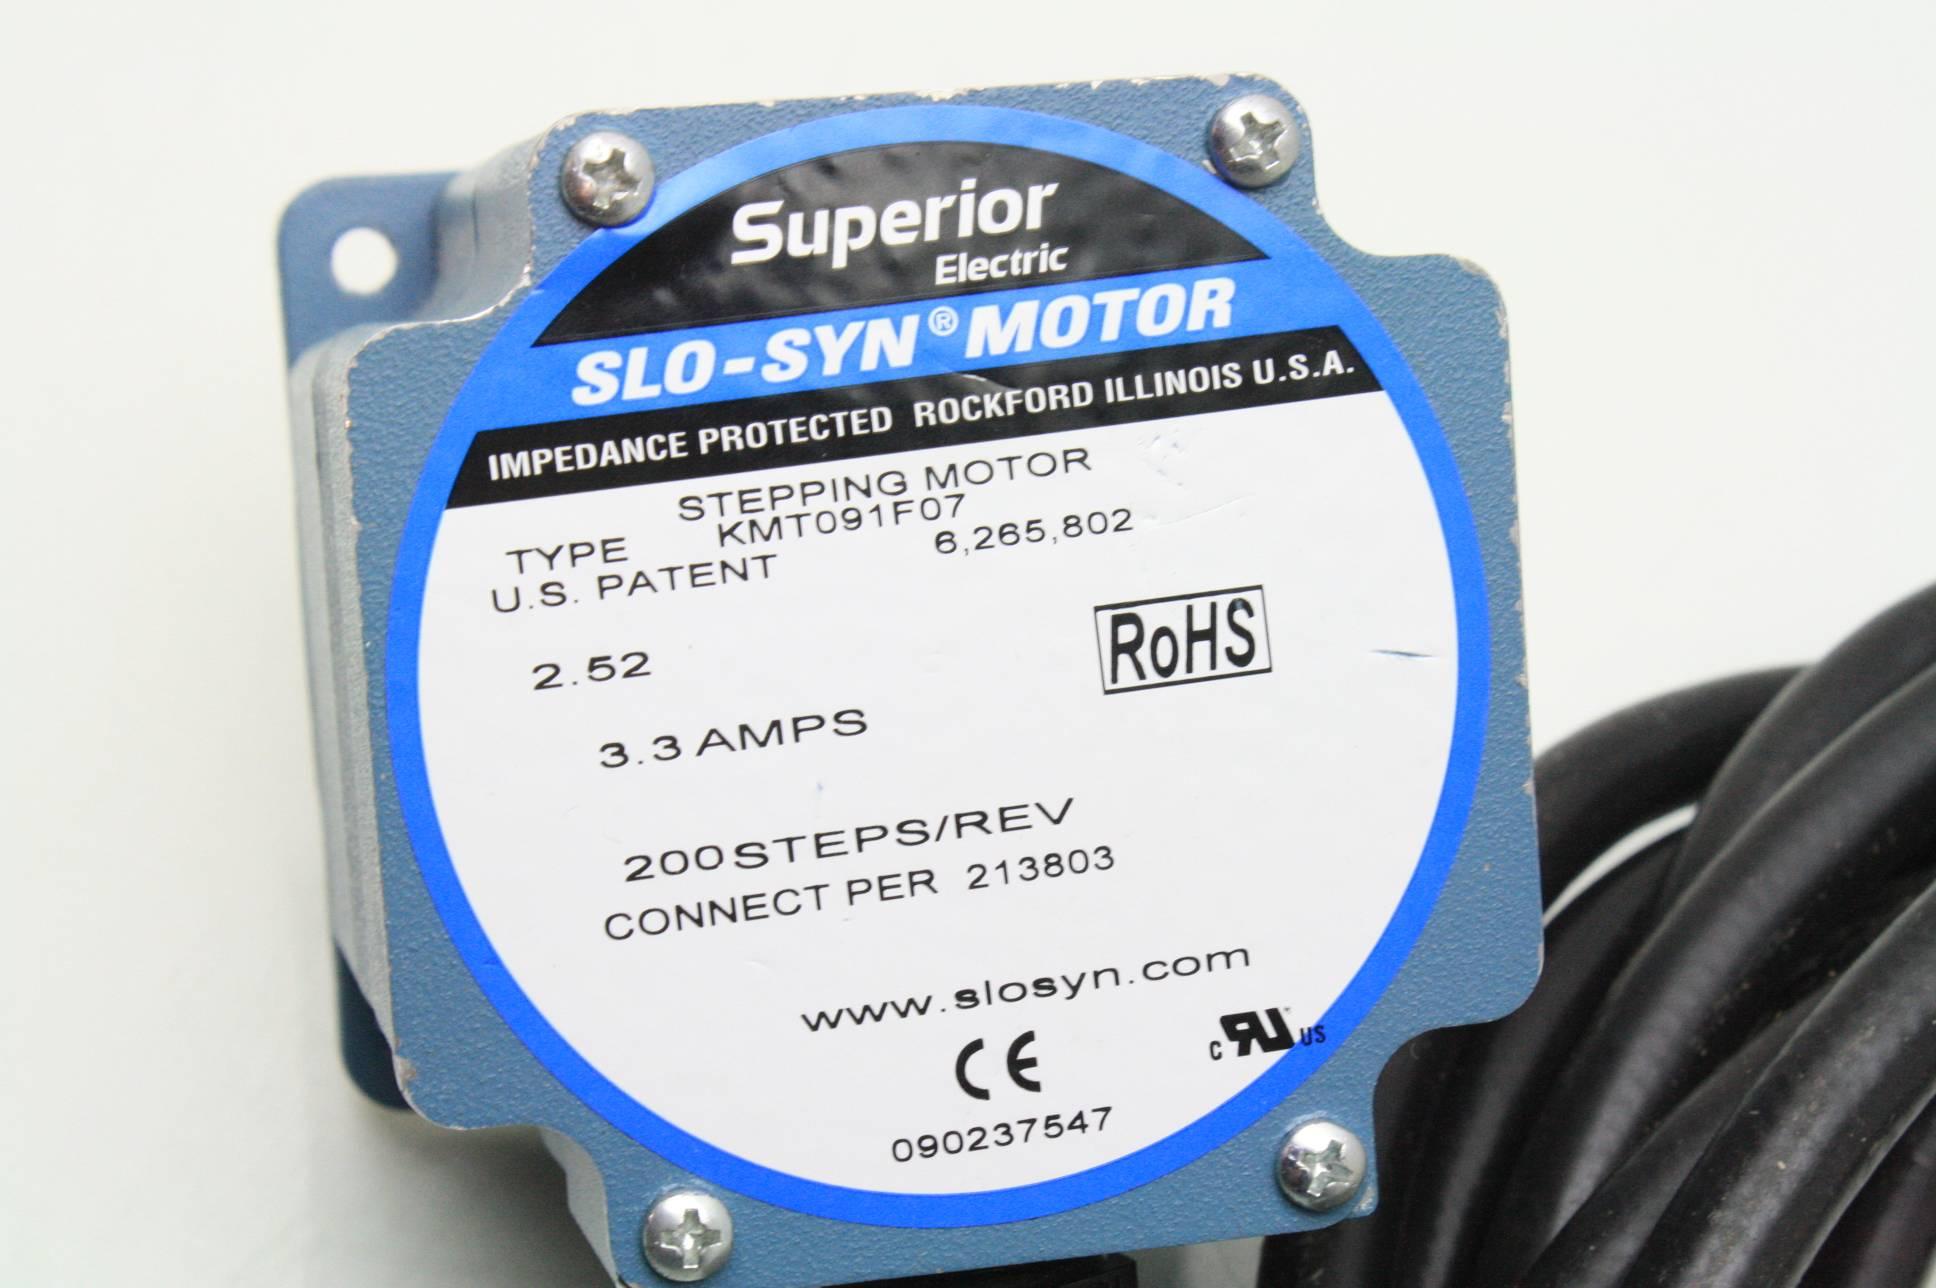 Description. Superior Electric Slo-Syn KMT091F07 Motor ... : slo syn motor wiring - yogabreezes.com